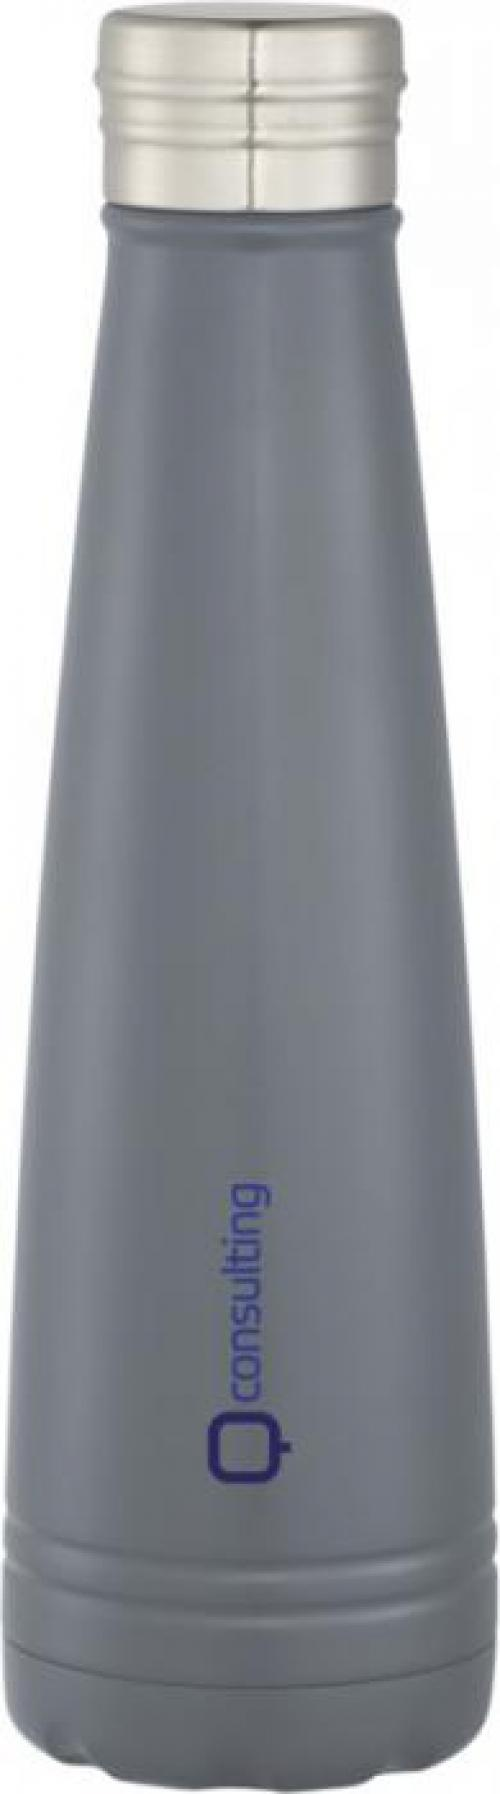 Botella isotérmica Duke